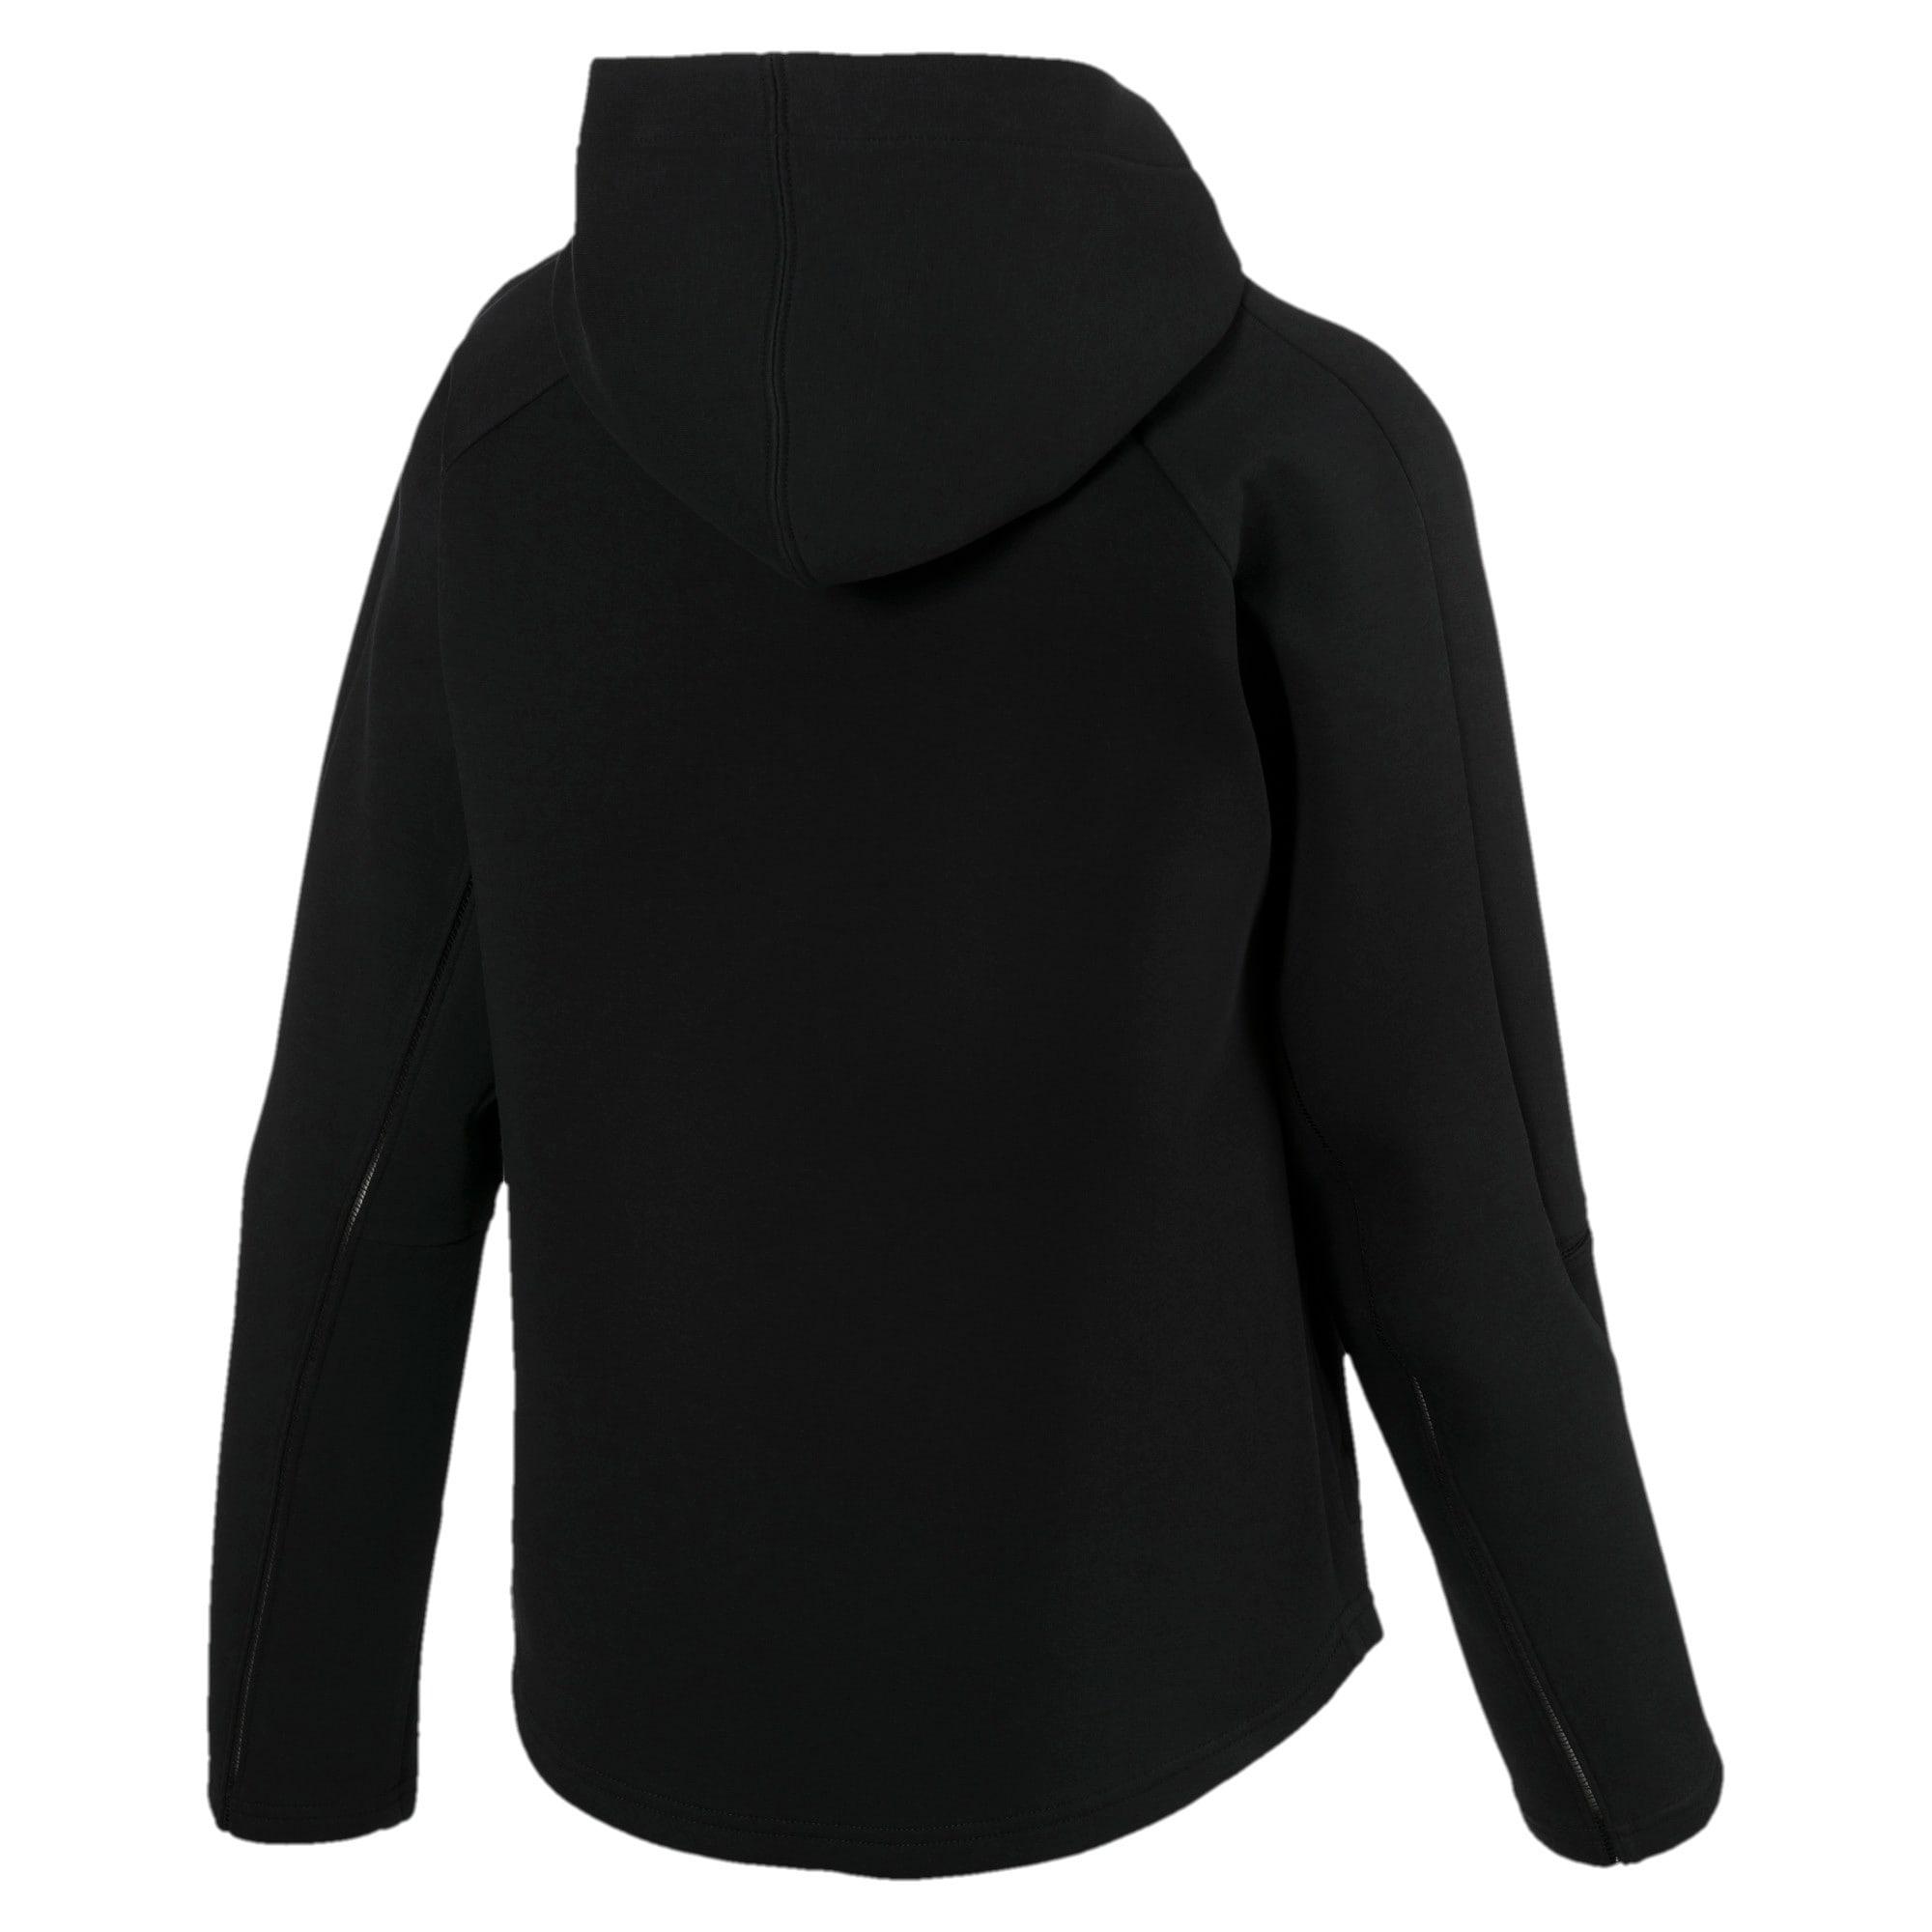 Thumbnail 5 of Evostripe Move Zip-Up Women's Hoodie, Cotton Black, medium